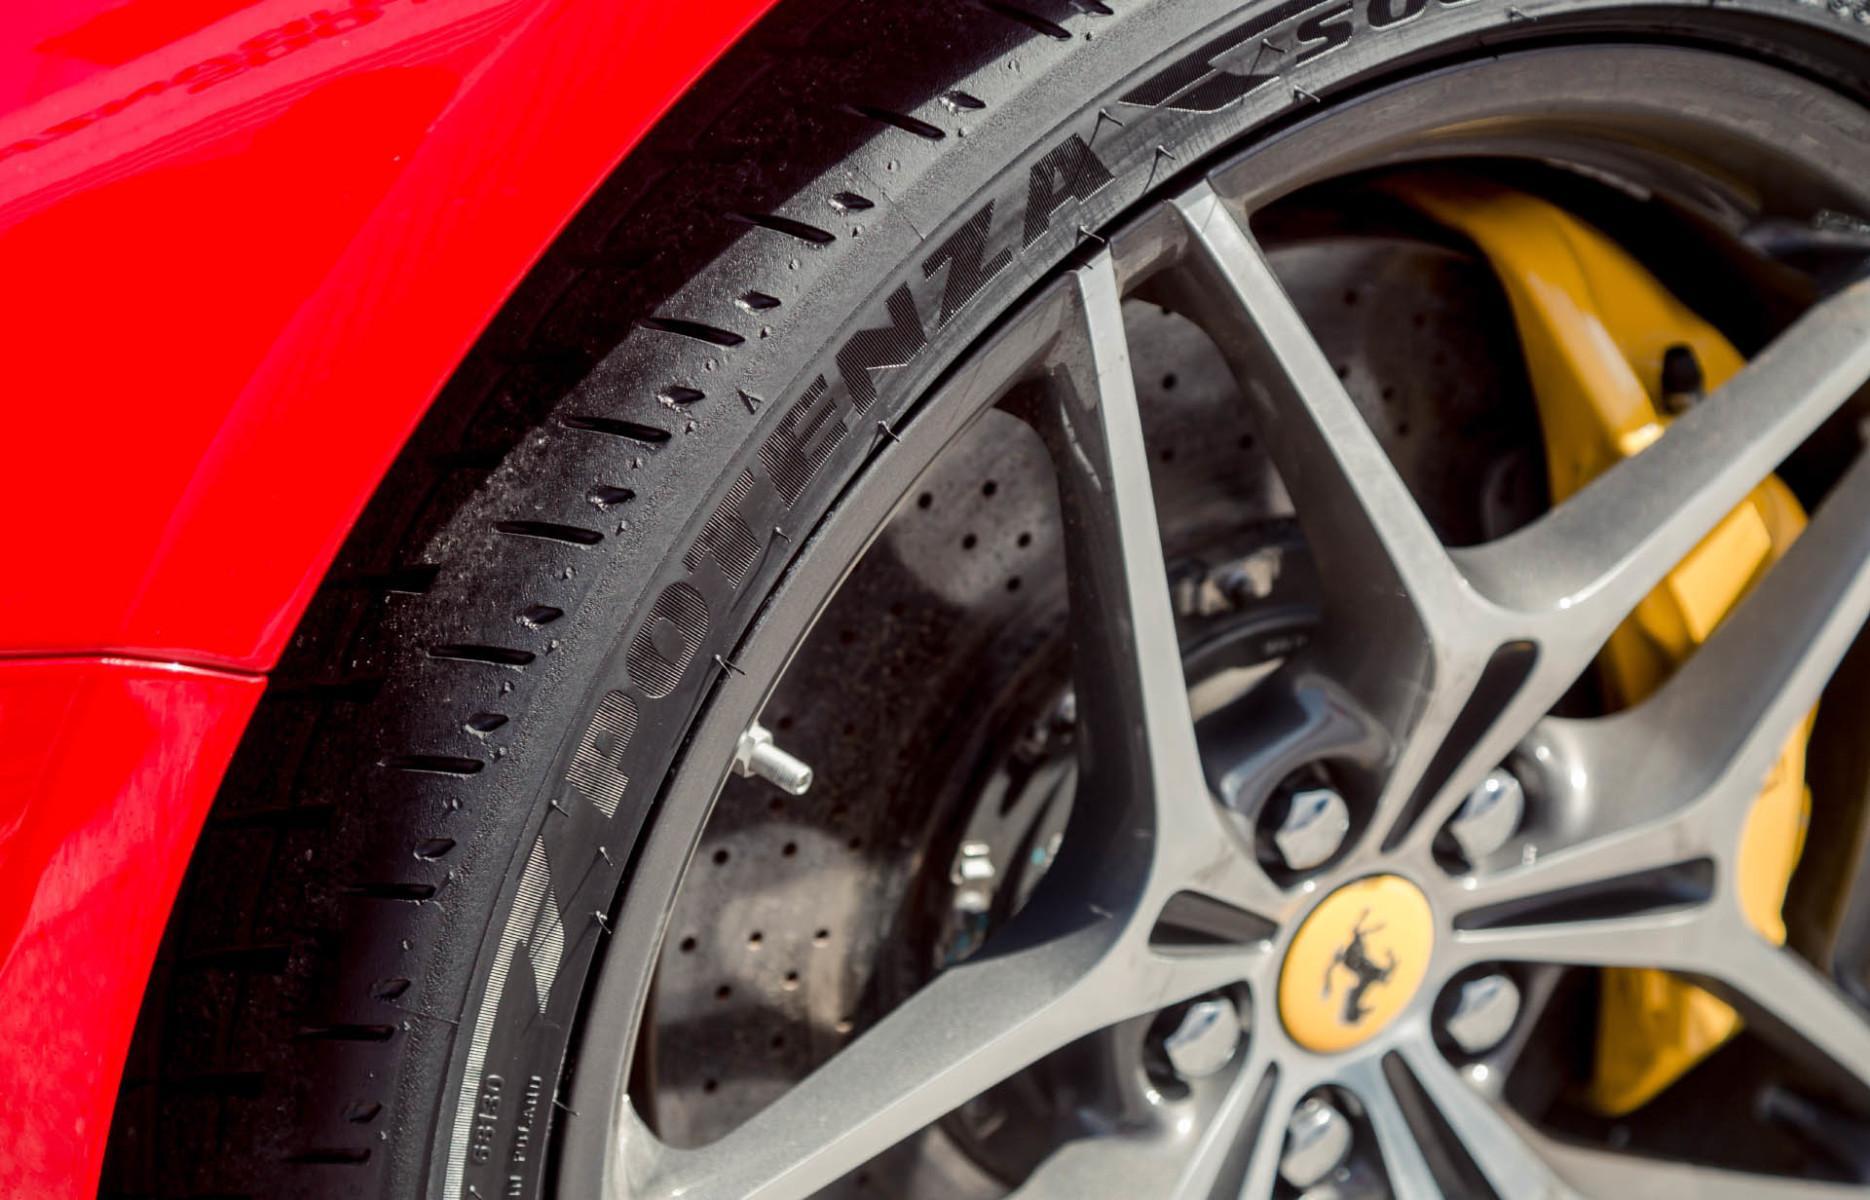 Разница в потенциалах тест-обзор шин Bridgestone Turanza Т005 и Bridgestone Potenza S007а